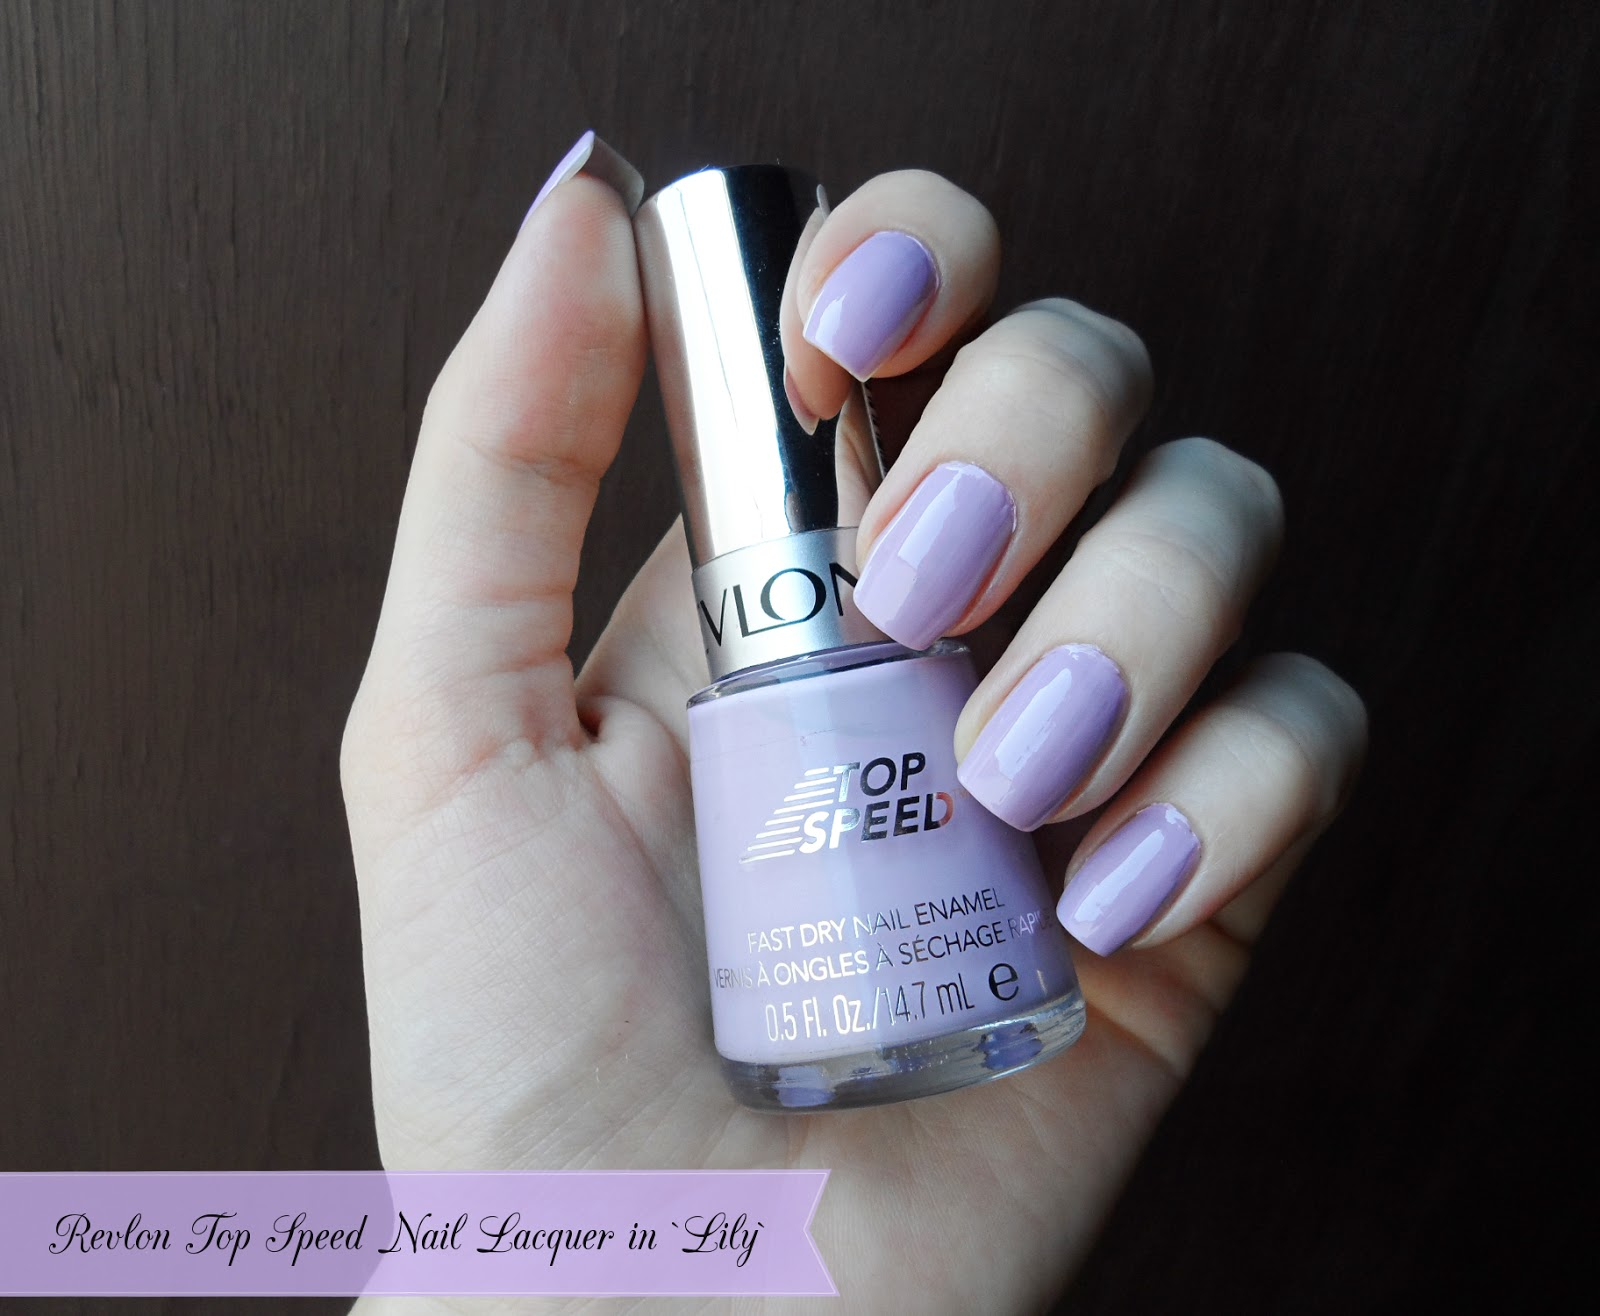 revlon nail polish review swatches, revlon cosmetics review